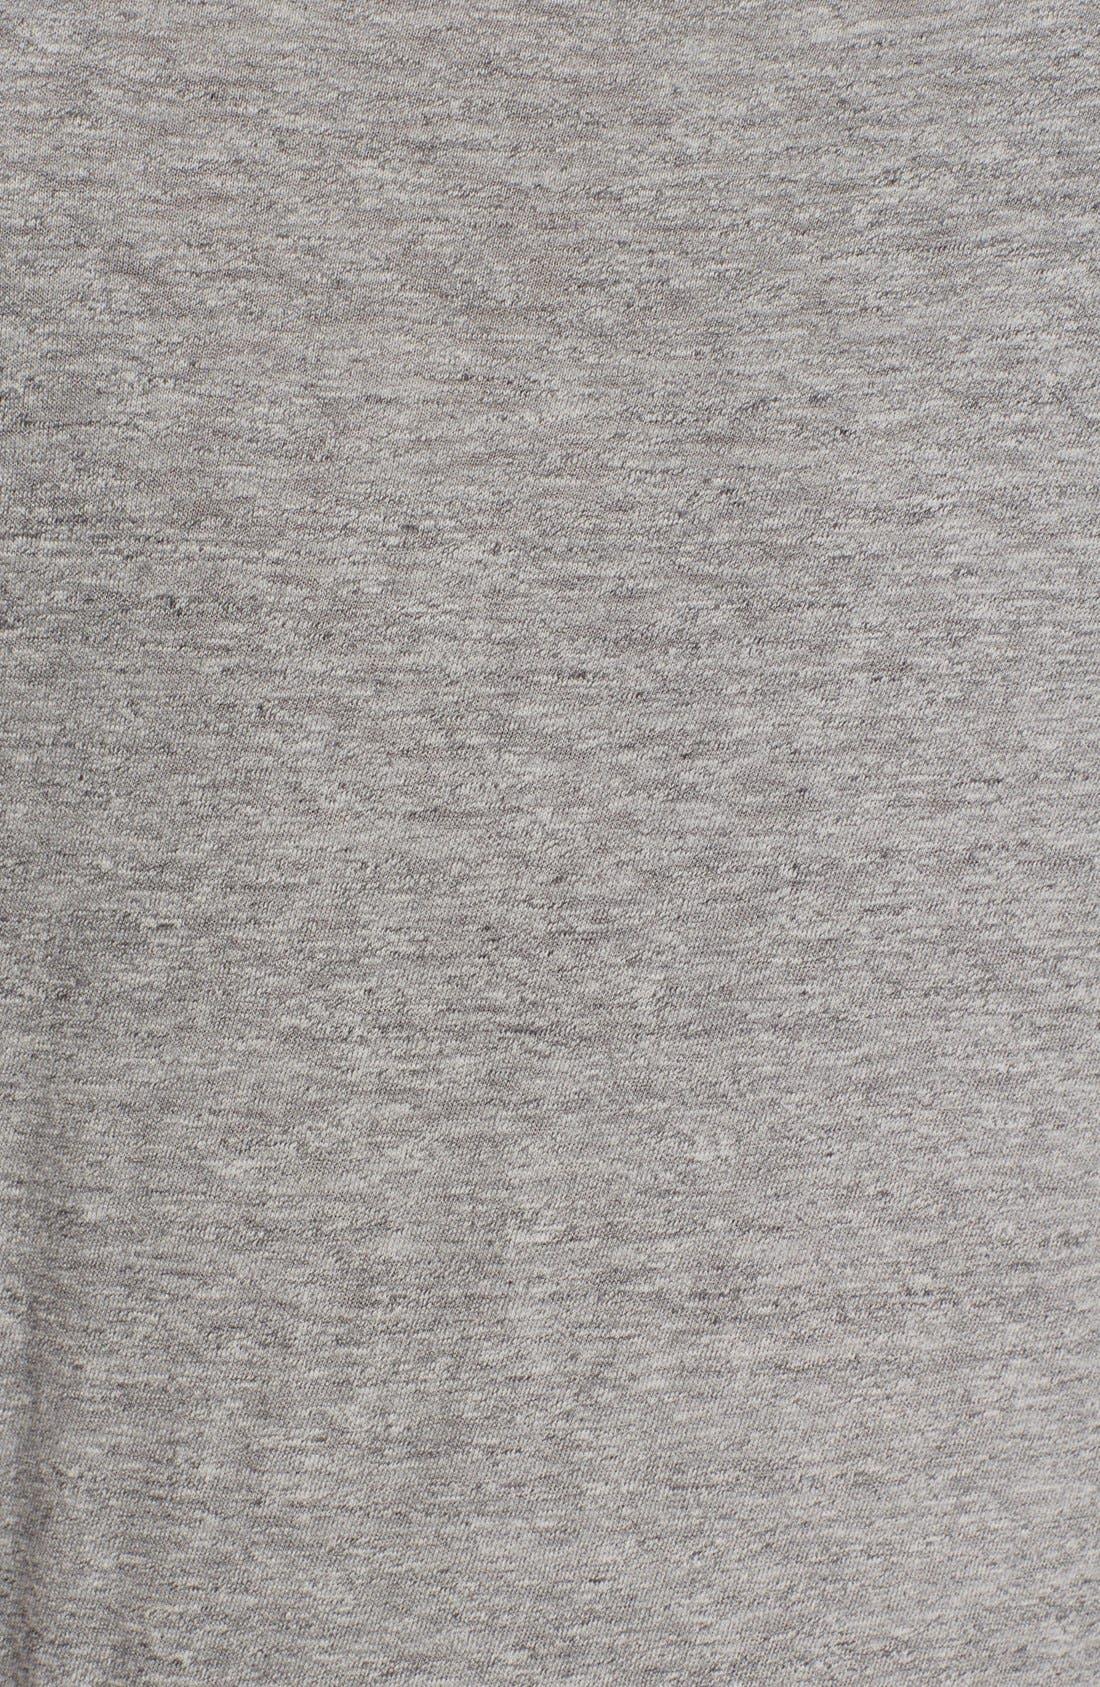 Alternate Image 3  - Tailgate 'Parole Whiskey' Trim Fit T-Shirt